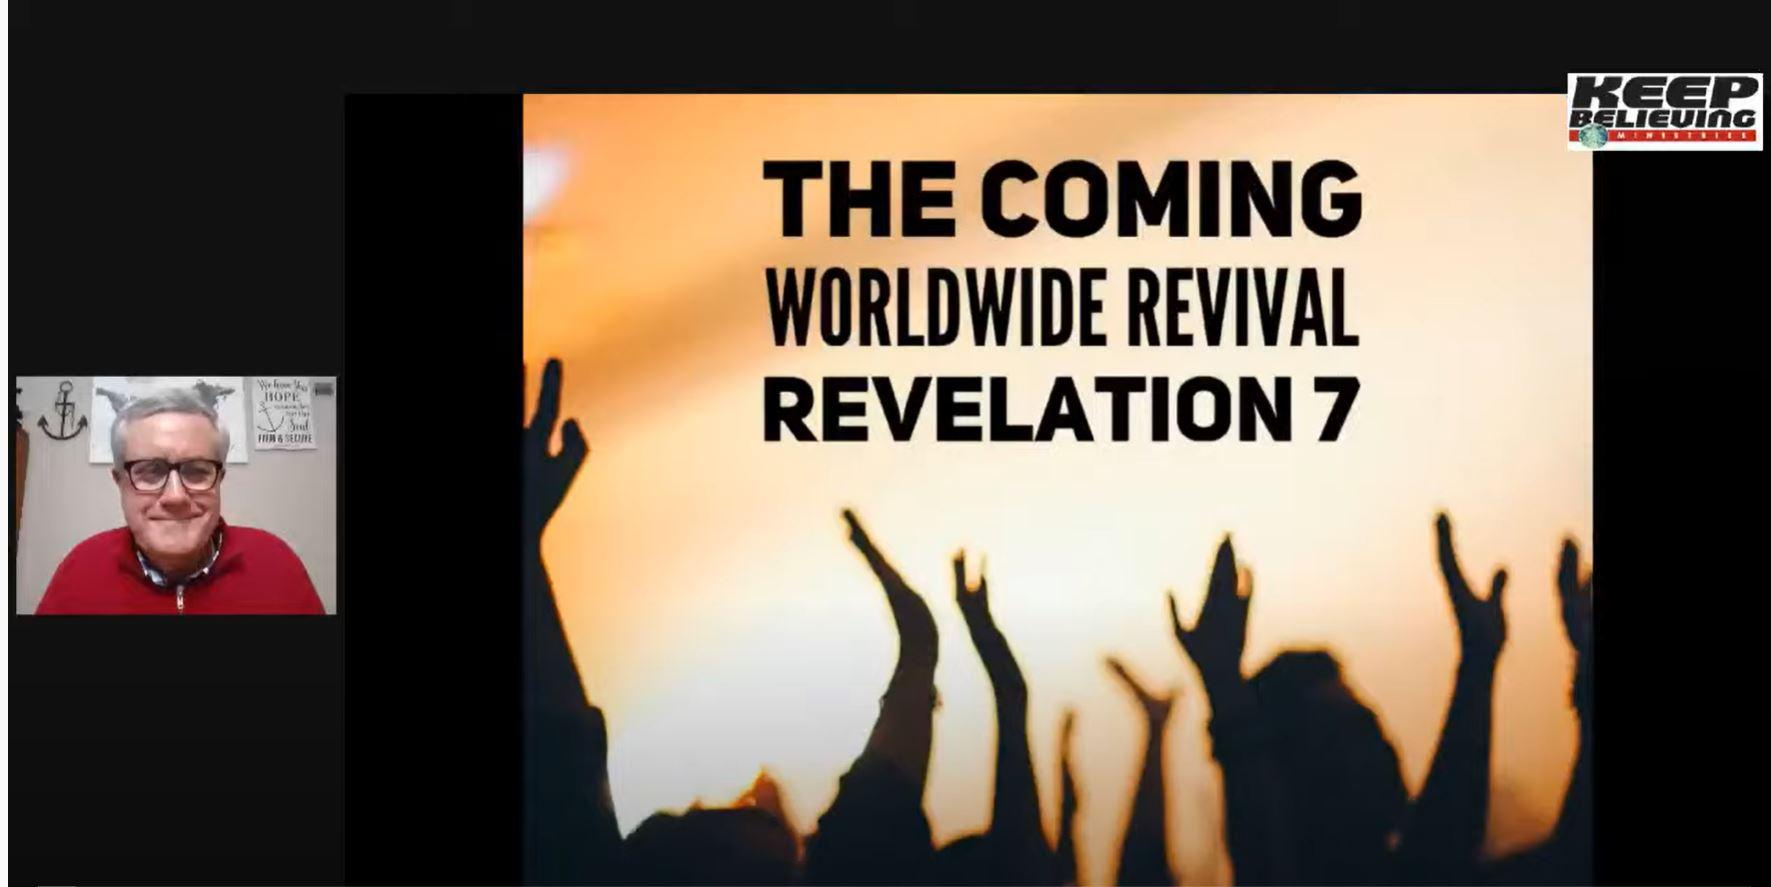 The Coming Worldwide Revival (Revelation 7)